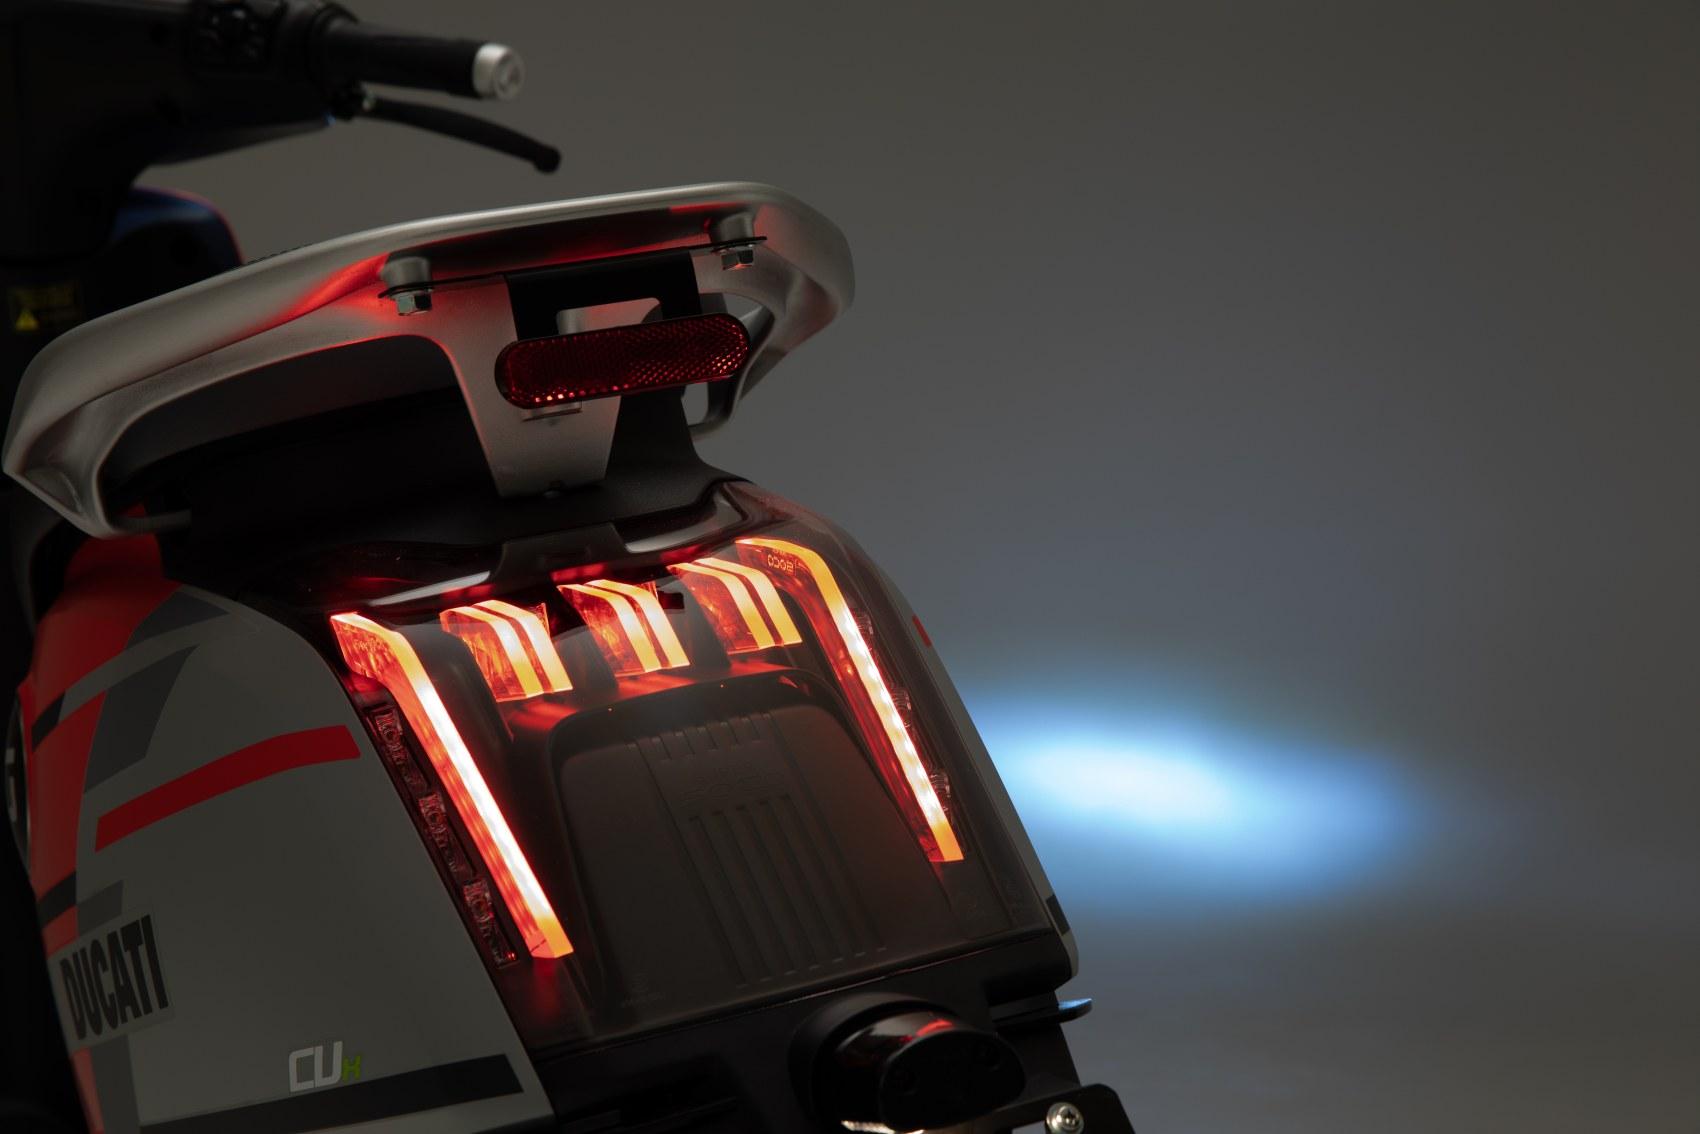 Super Soco CUx electric scooter Ducati Edition rear light